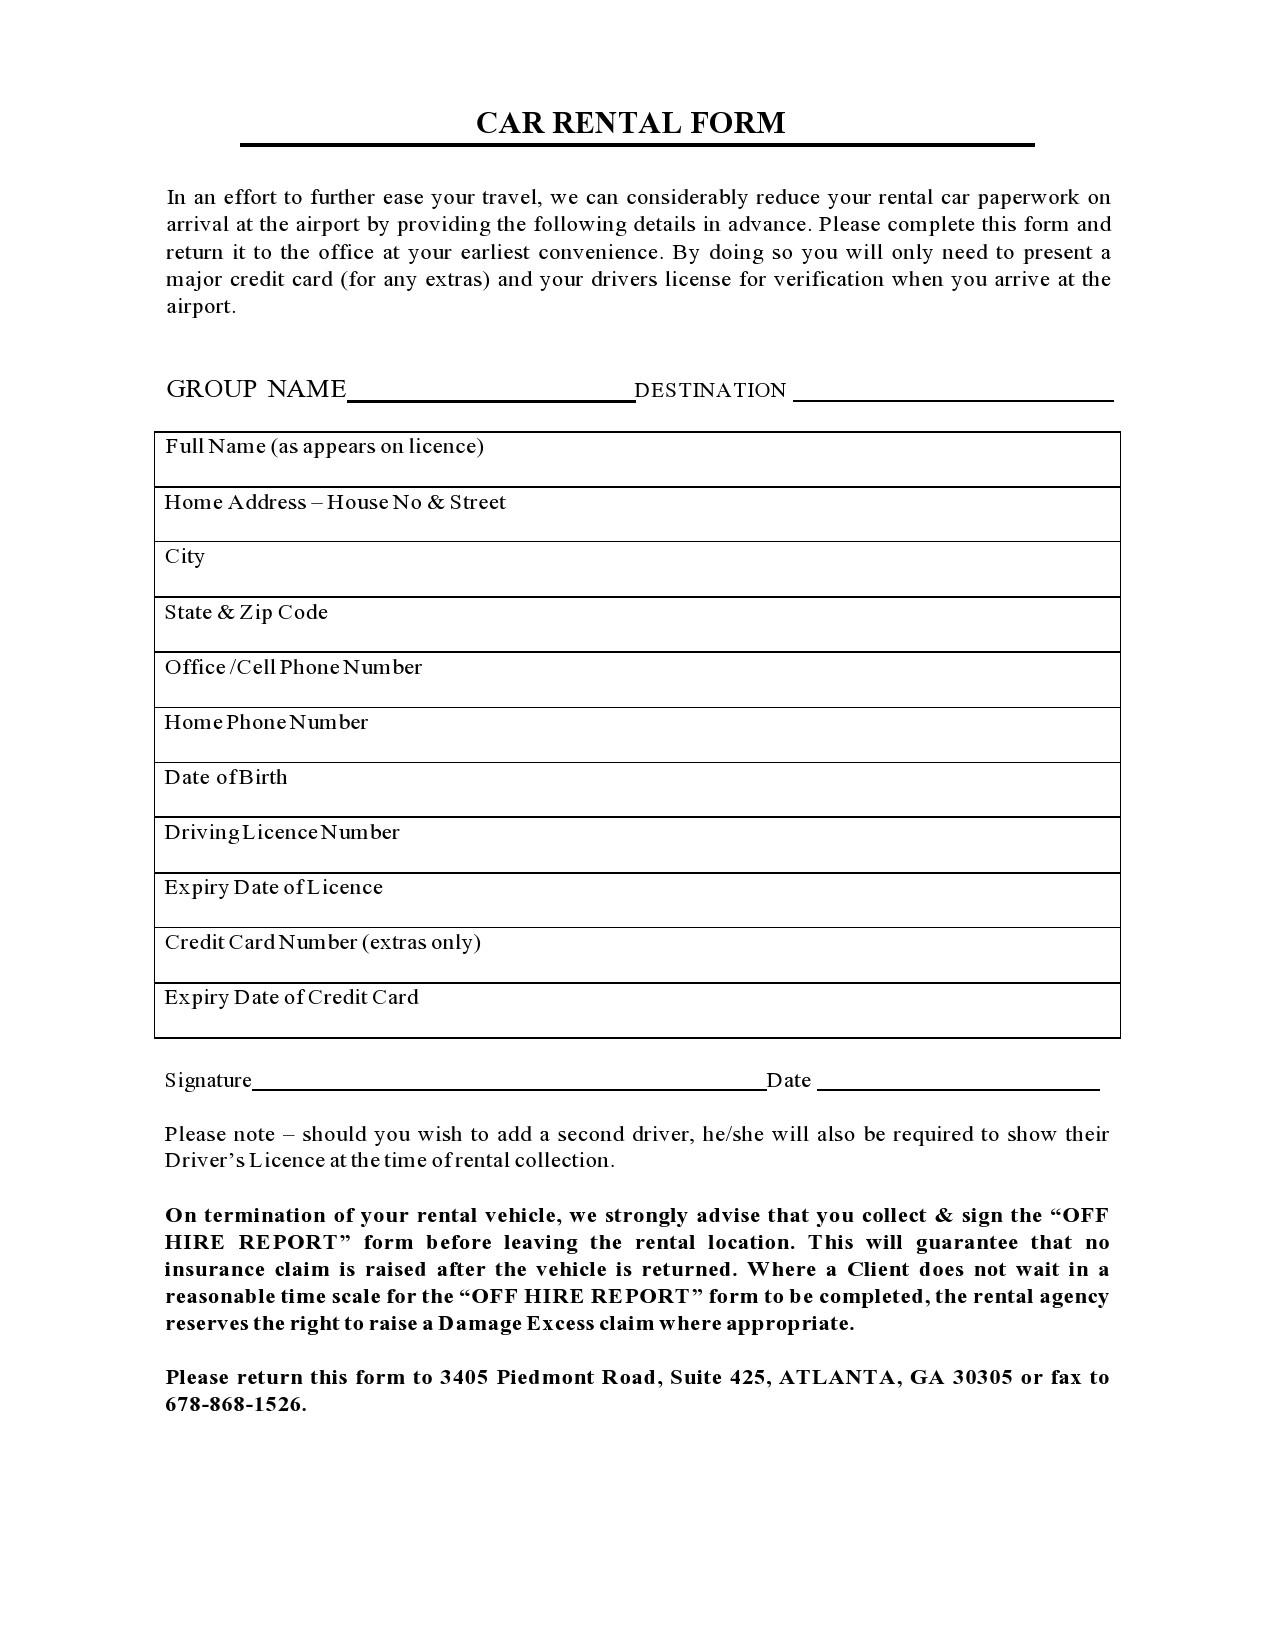 Free car rental agreement 33